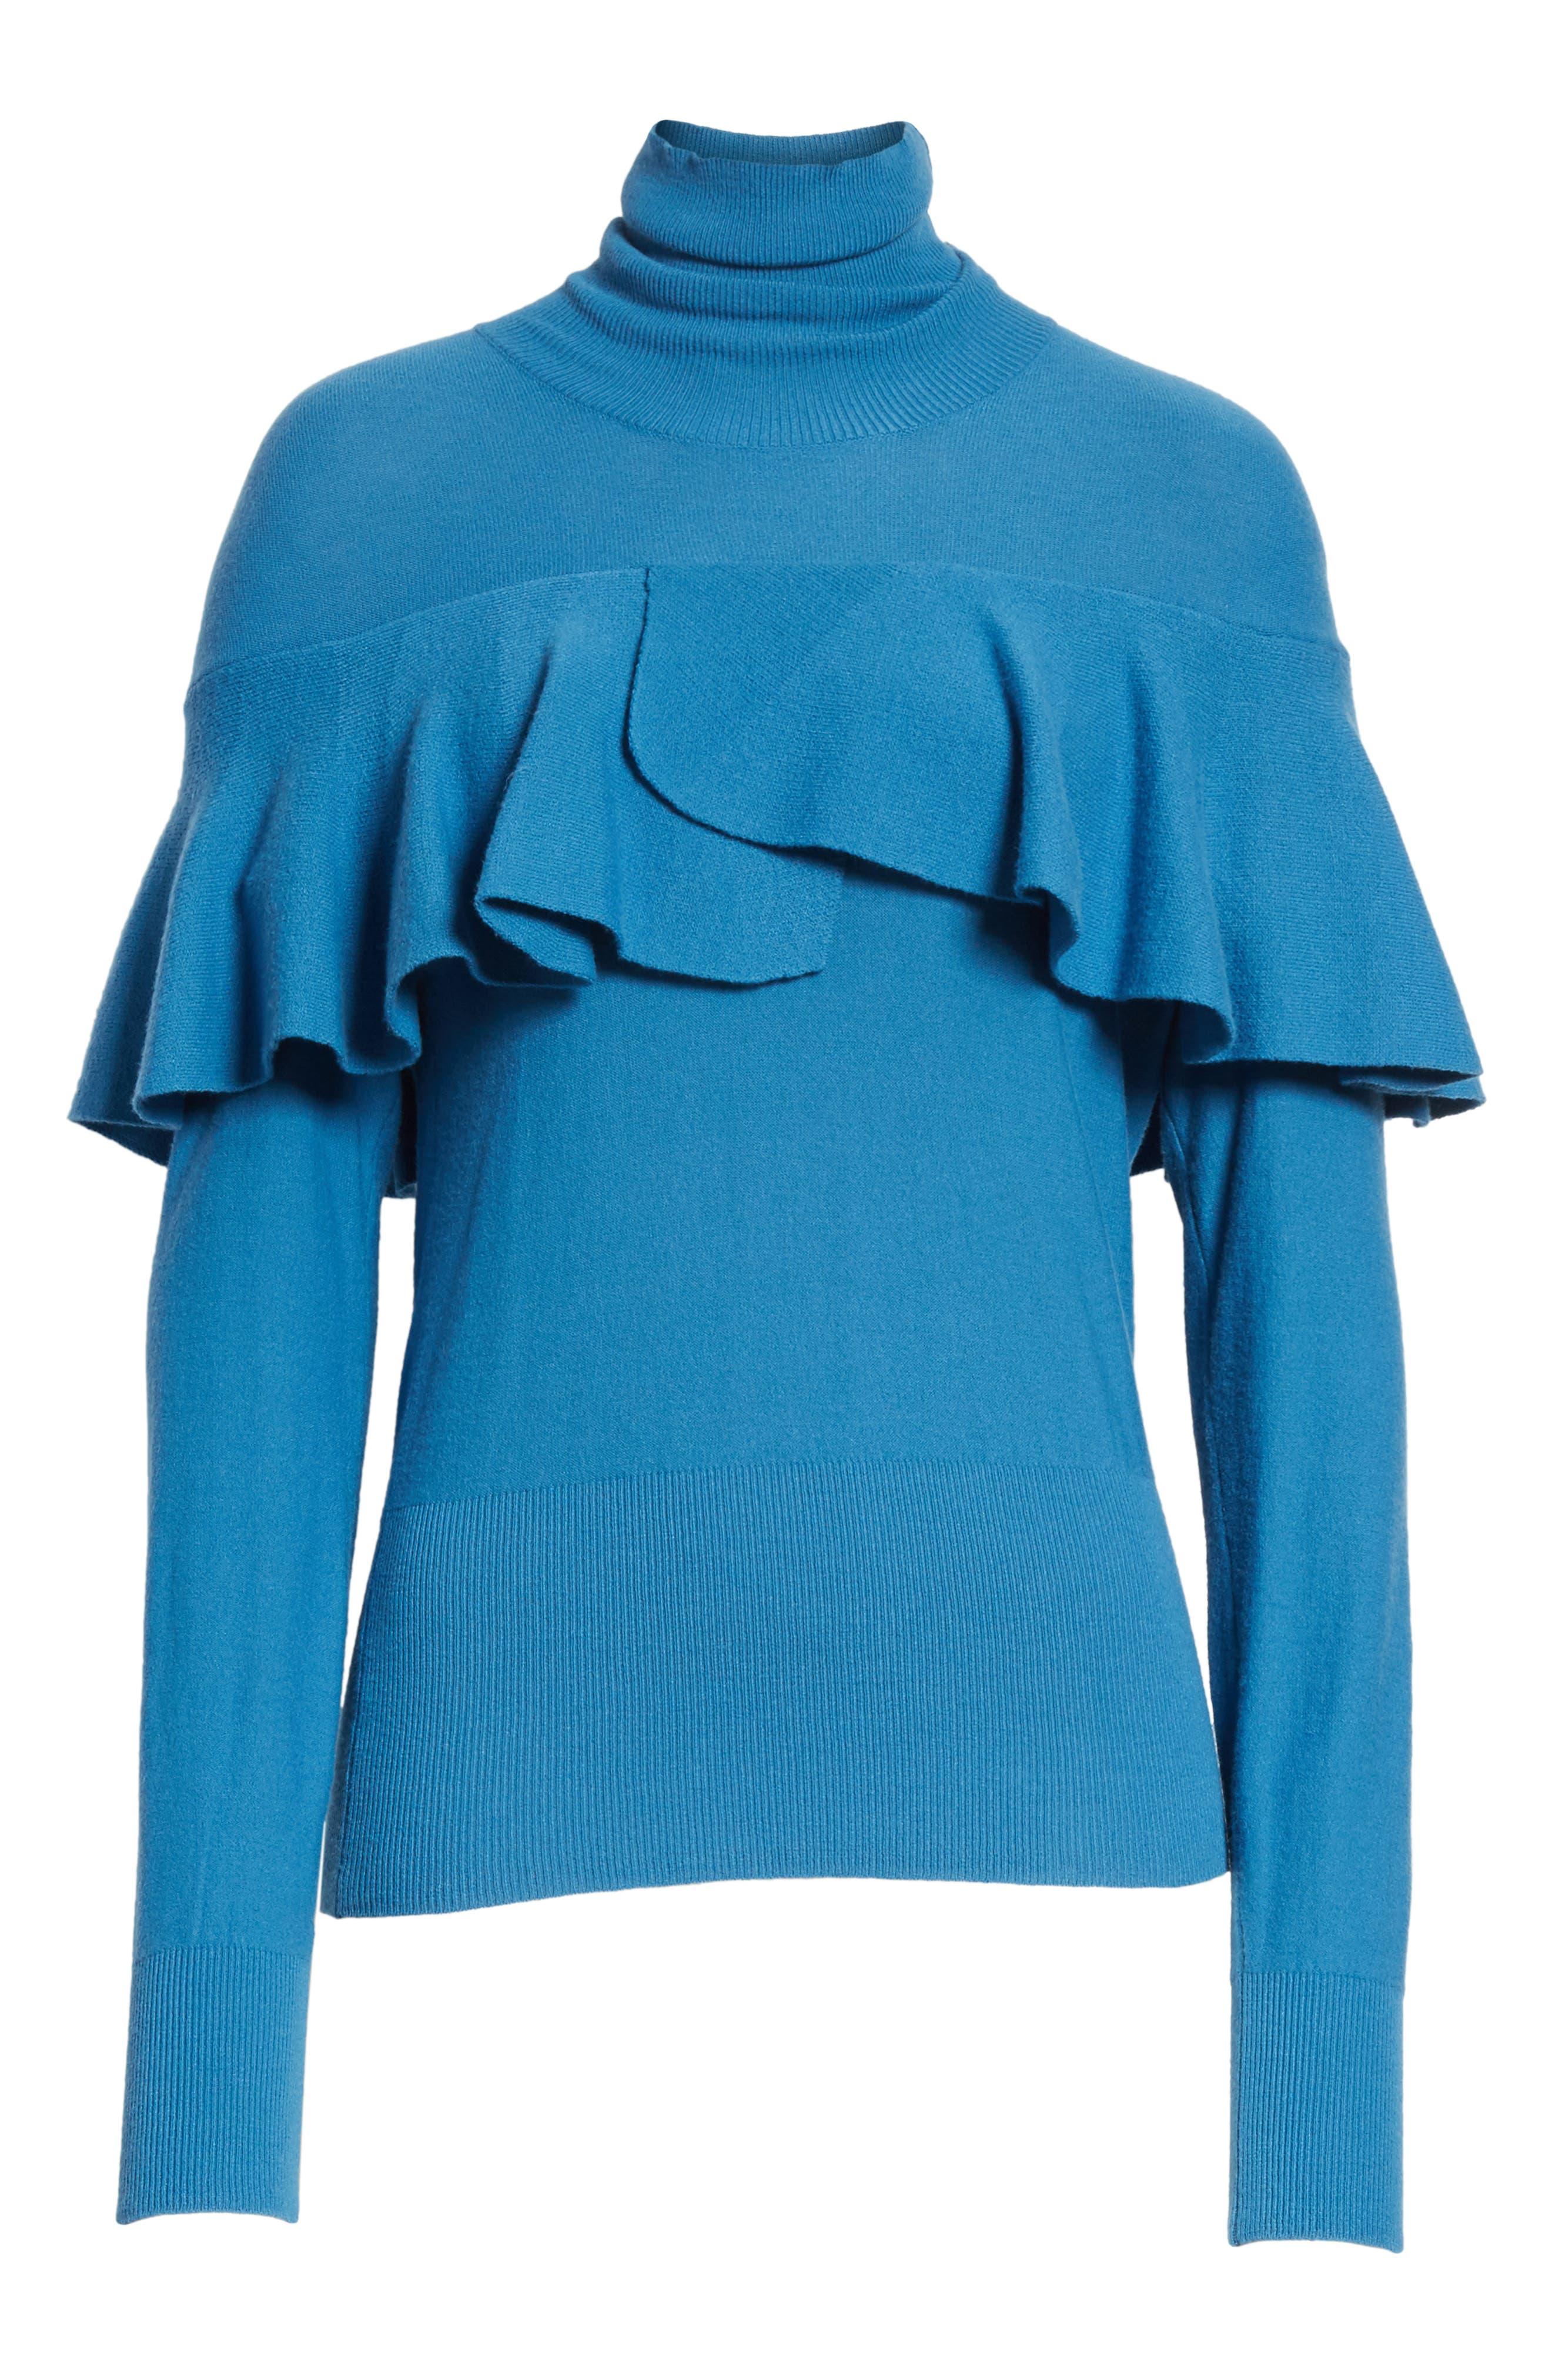 Flounced Turtleneck Sweater,                             Alternate thumbnail 6, color,                             487